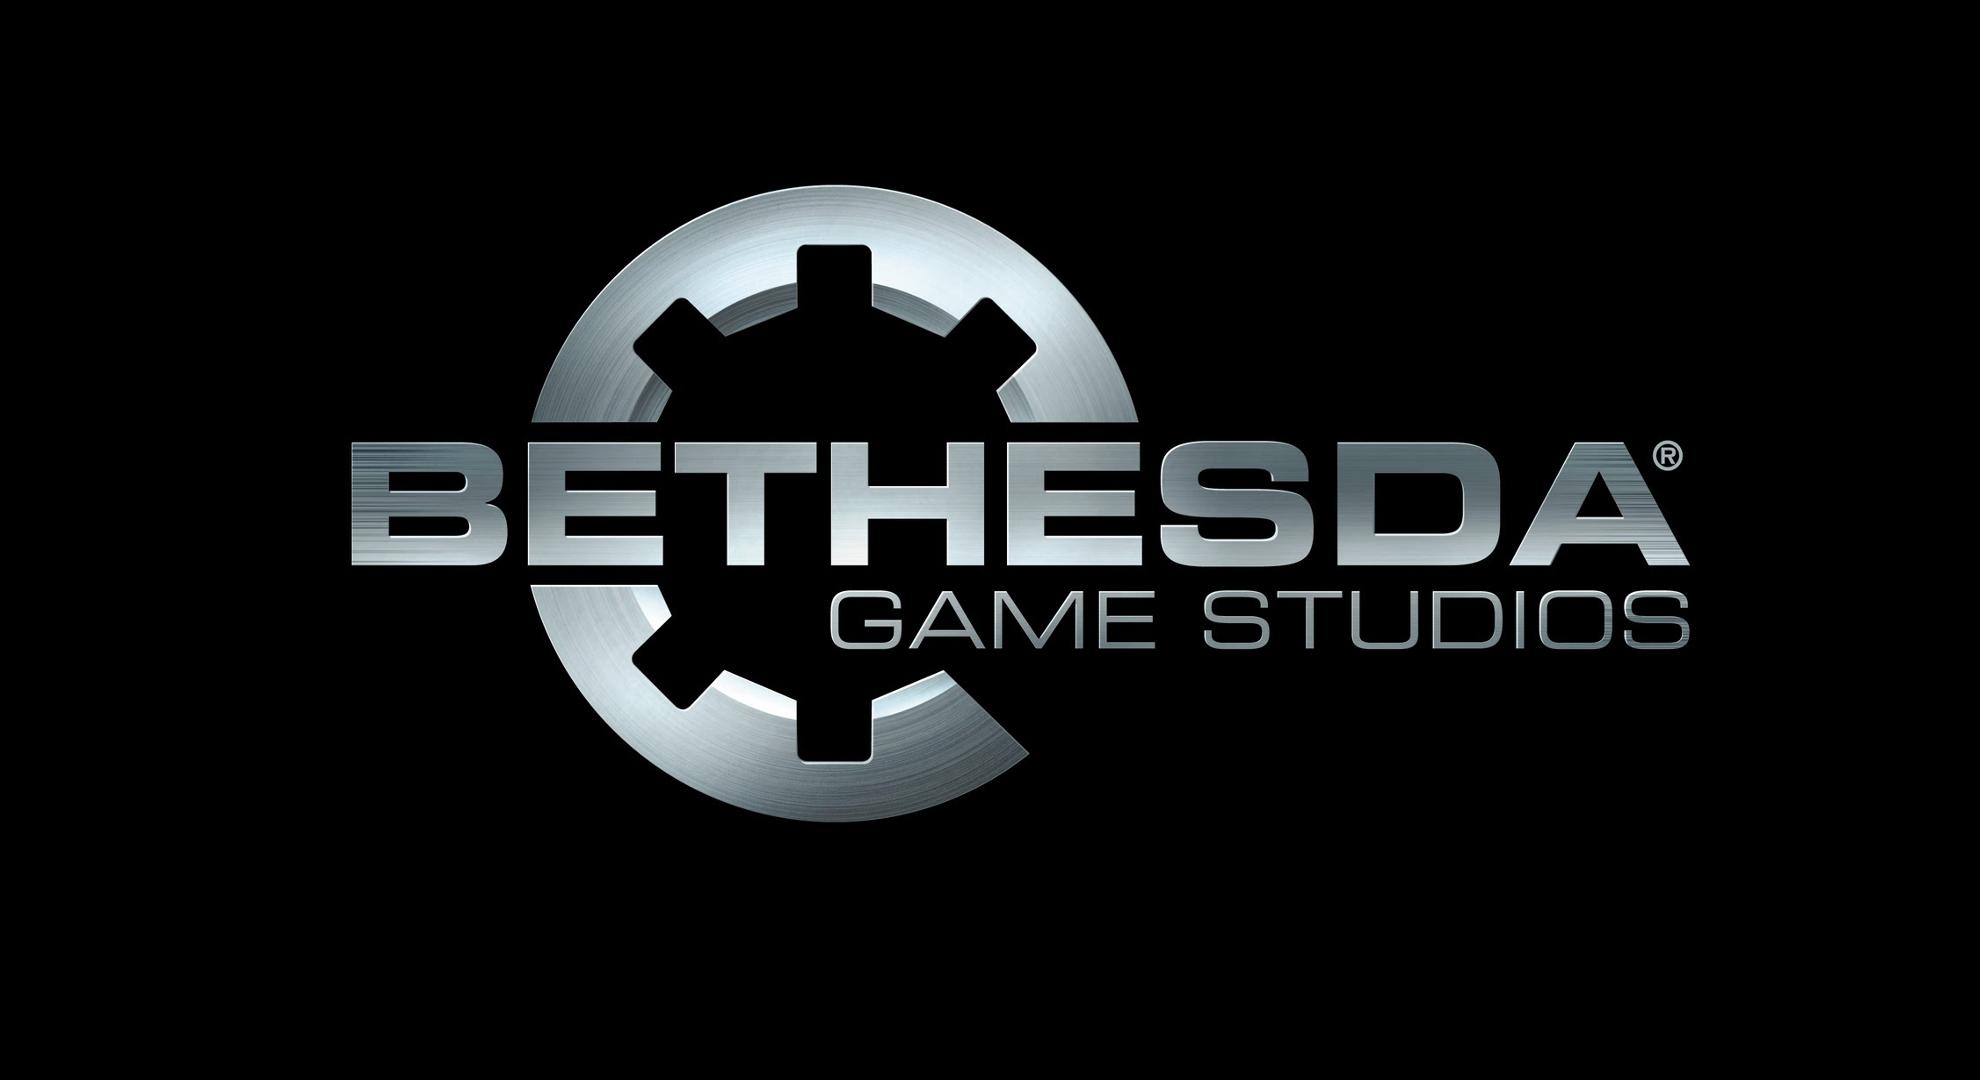 Bethesda game studios full hd wallpaper and background - Gaming logo wallpaper ...